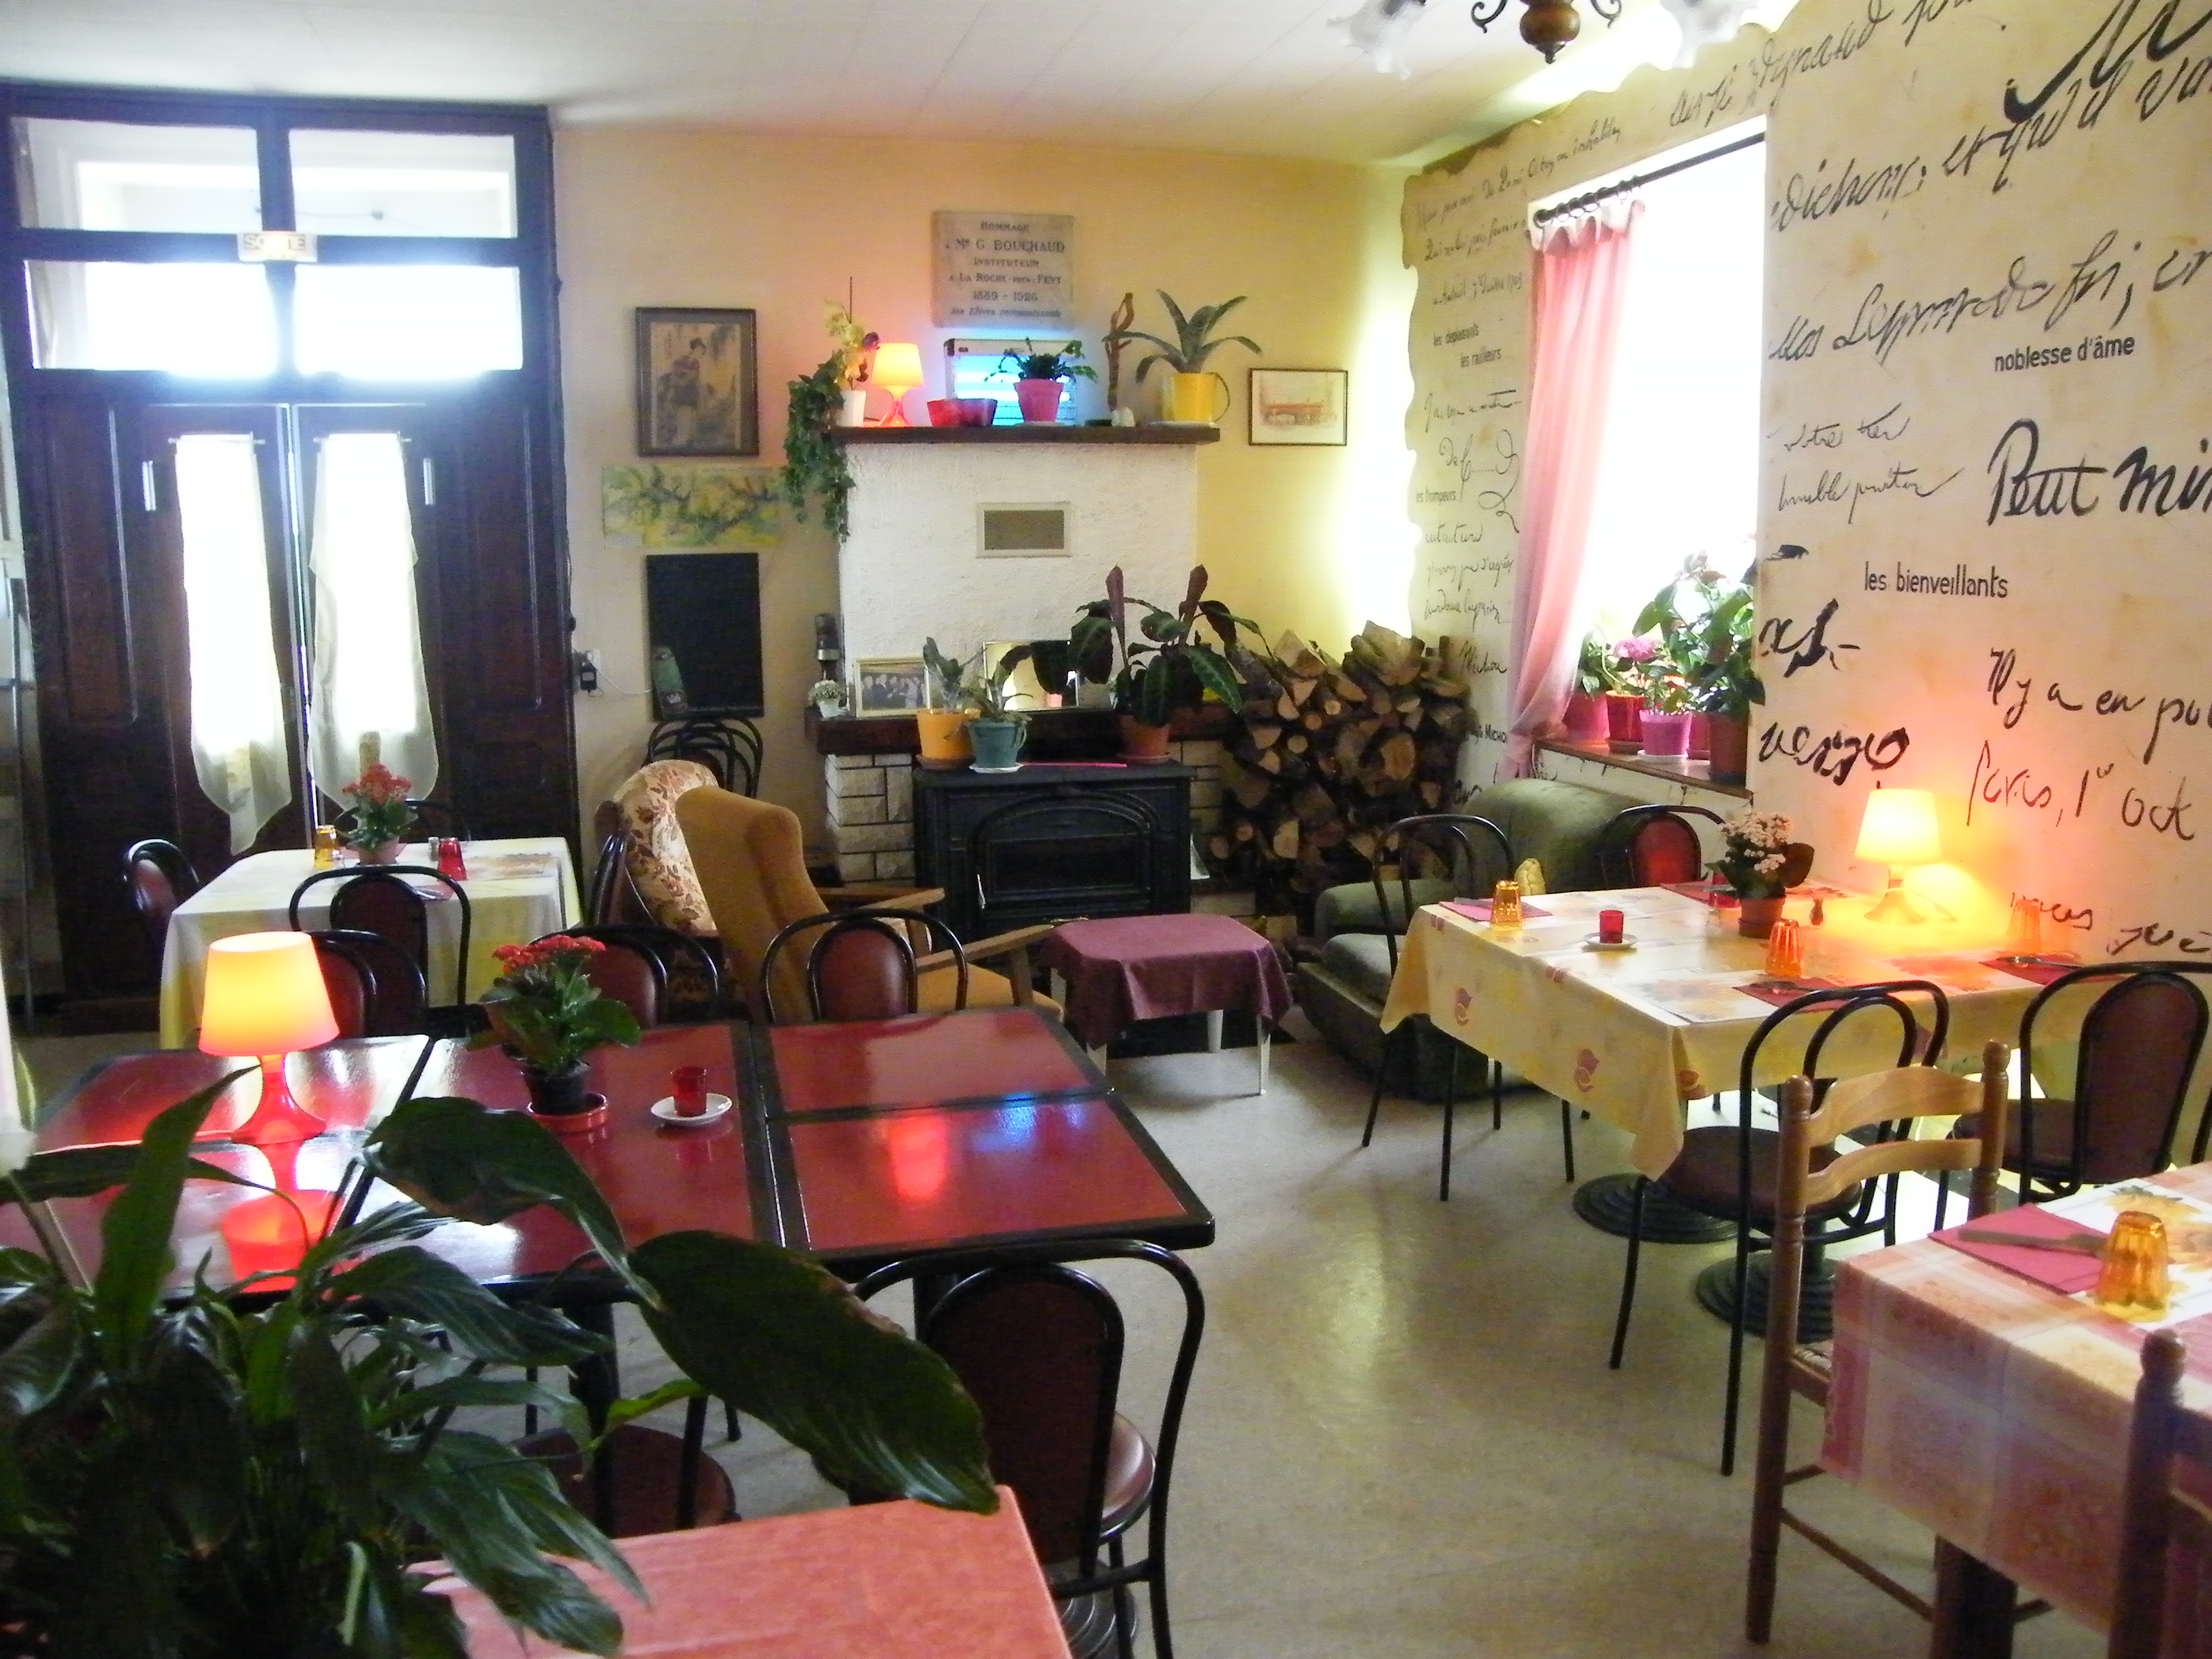 Restaurant le jardin du siam laroque d 39 olmes for Restaurant le jardin vias